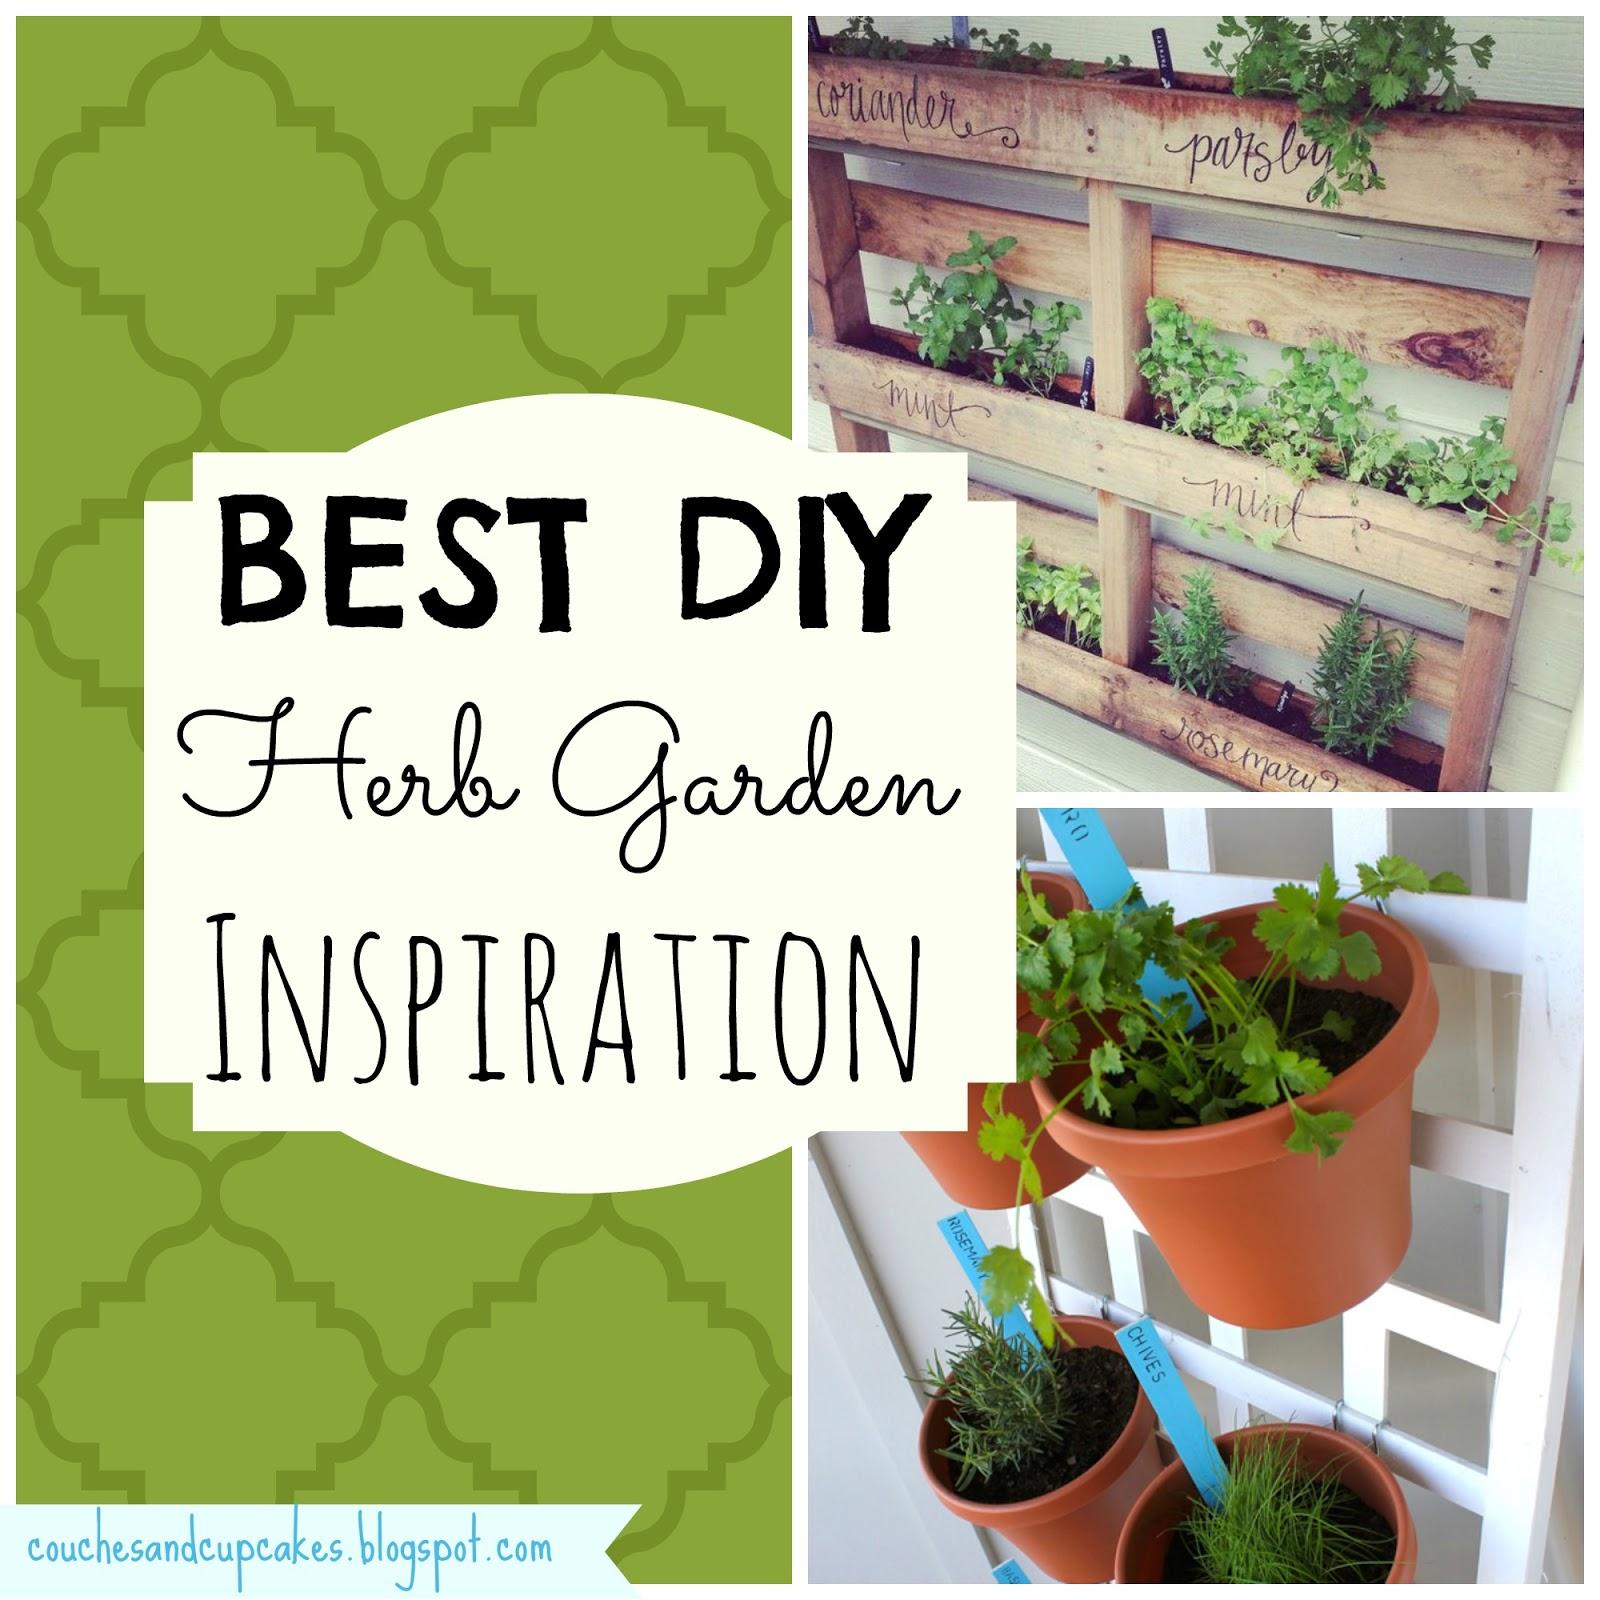 Patio Herb Garden Idea: Couches And Cupcakes: Best DIY Herb Garden Ideas